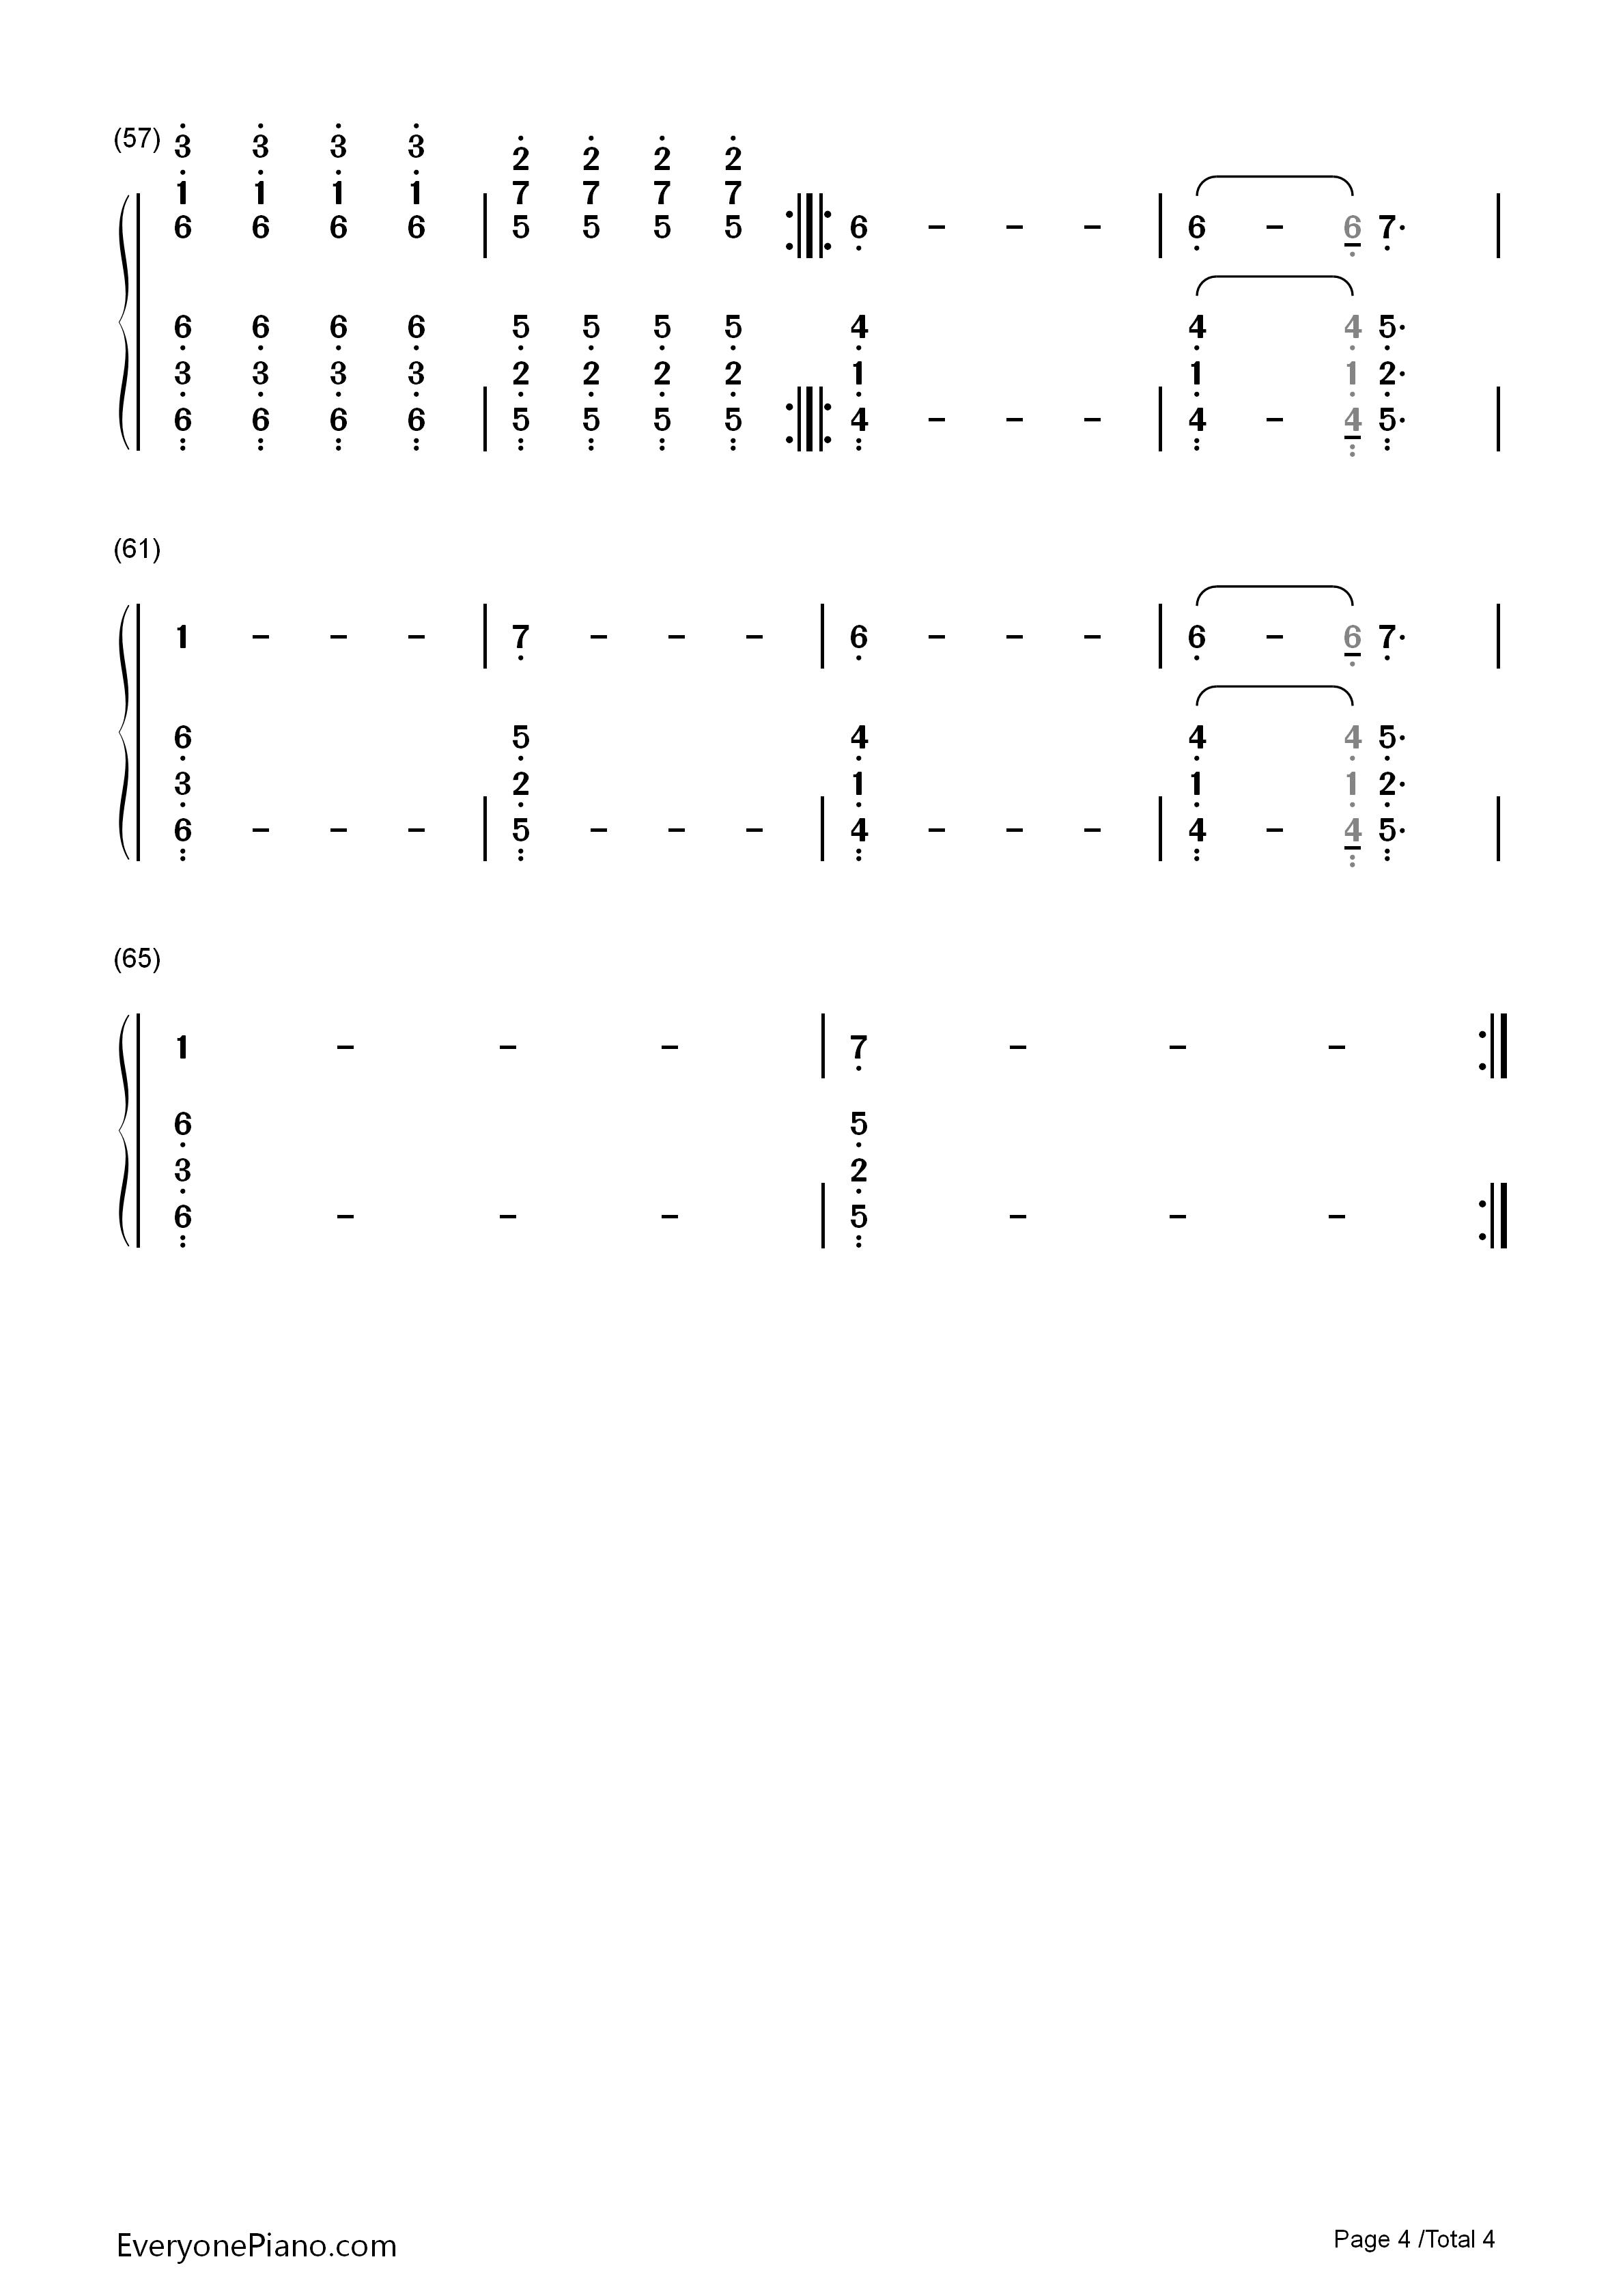 Car Radio-Twenty One Pilots Numbered Musical Notation Preview 4-Free Piano Sheet Music u0026 Piano ...